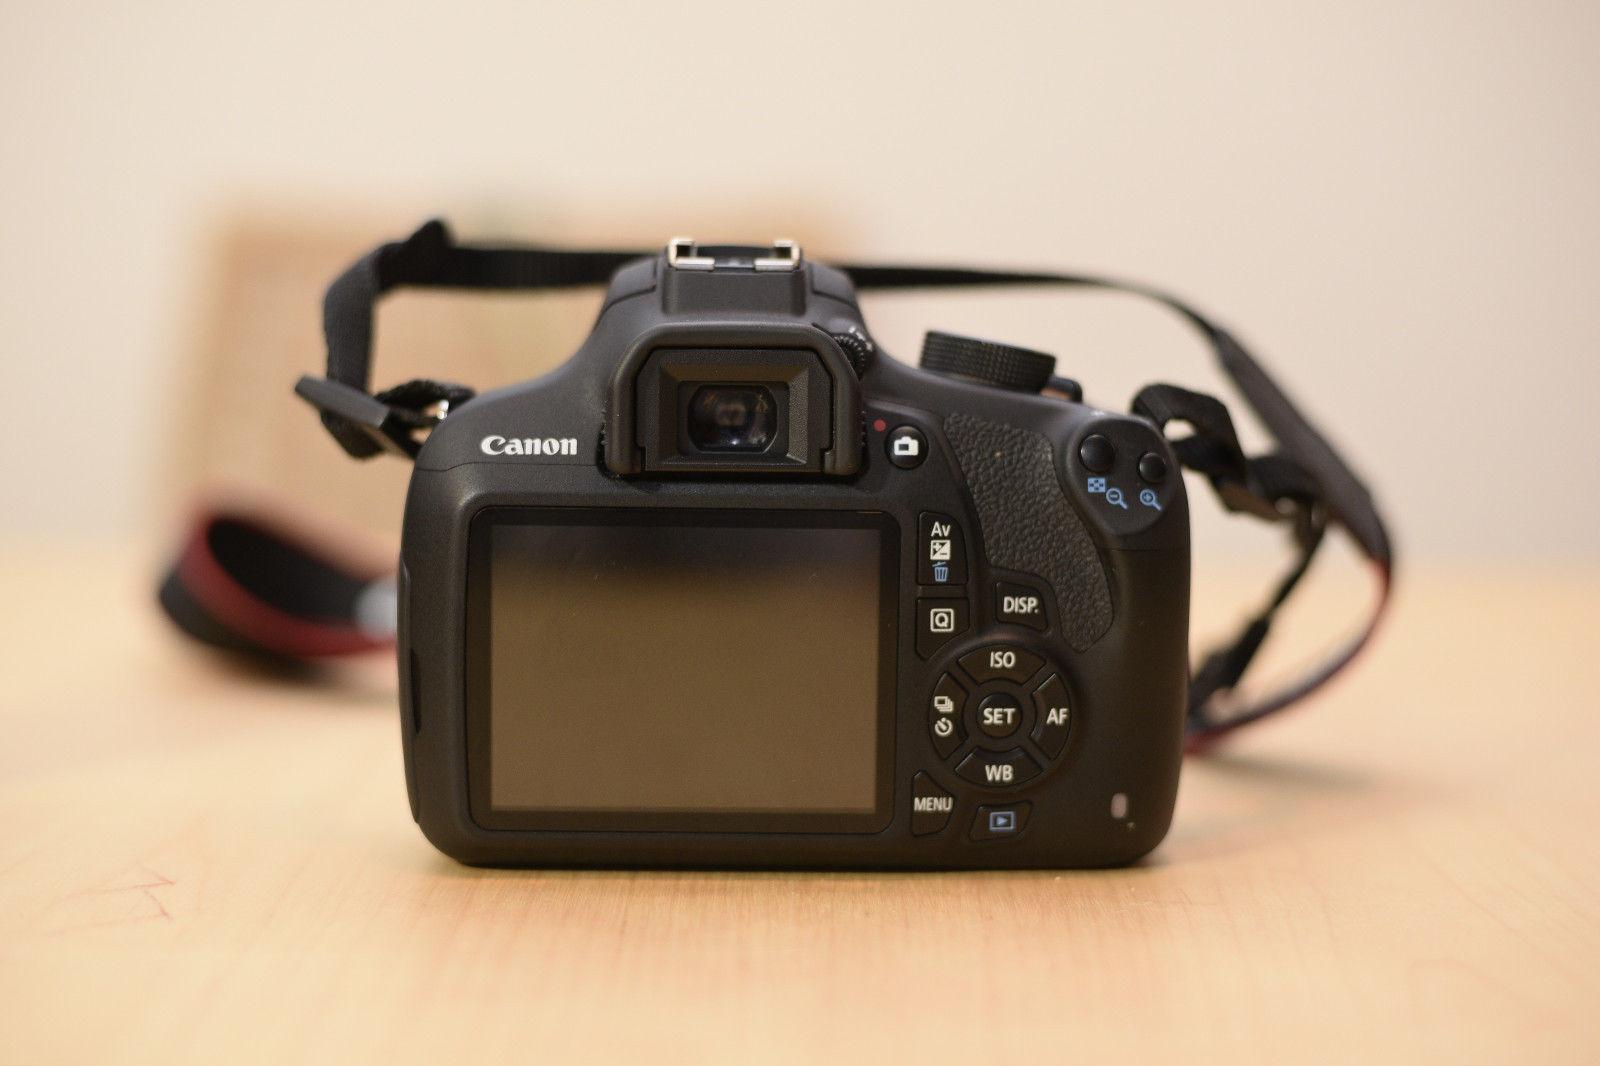 MINT Canon Rebel T5 SLR Camera...